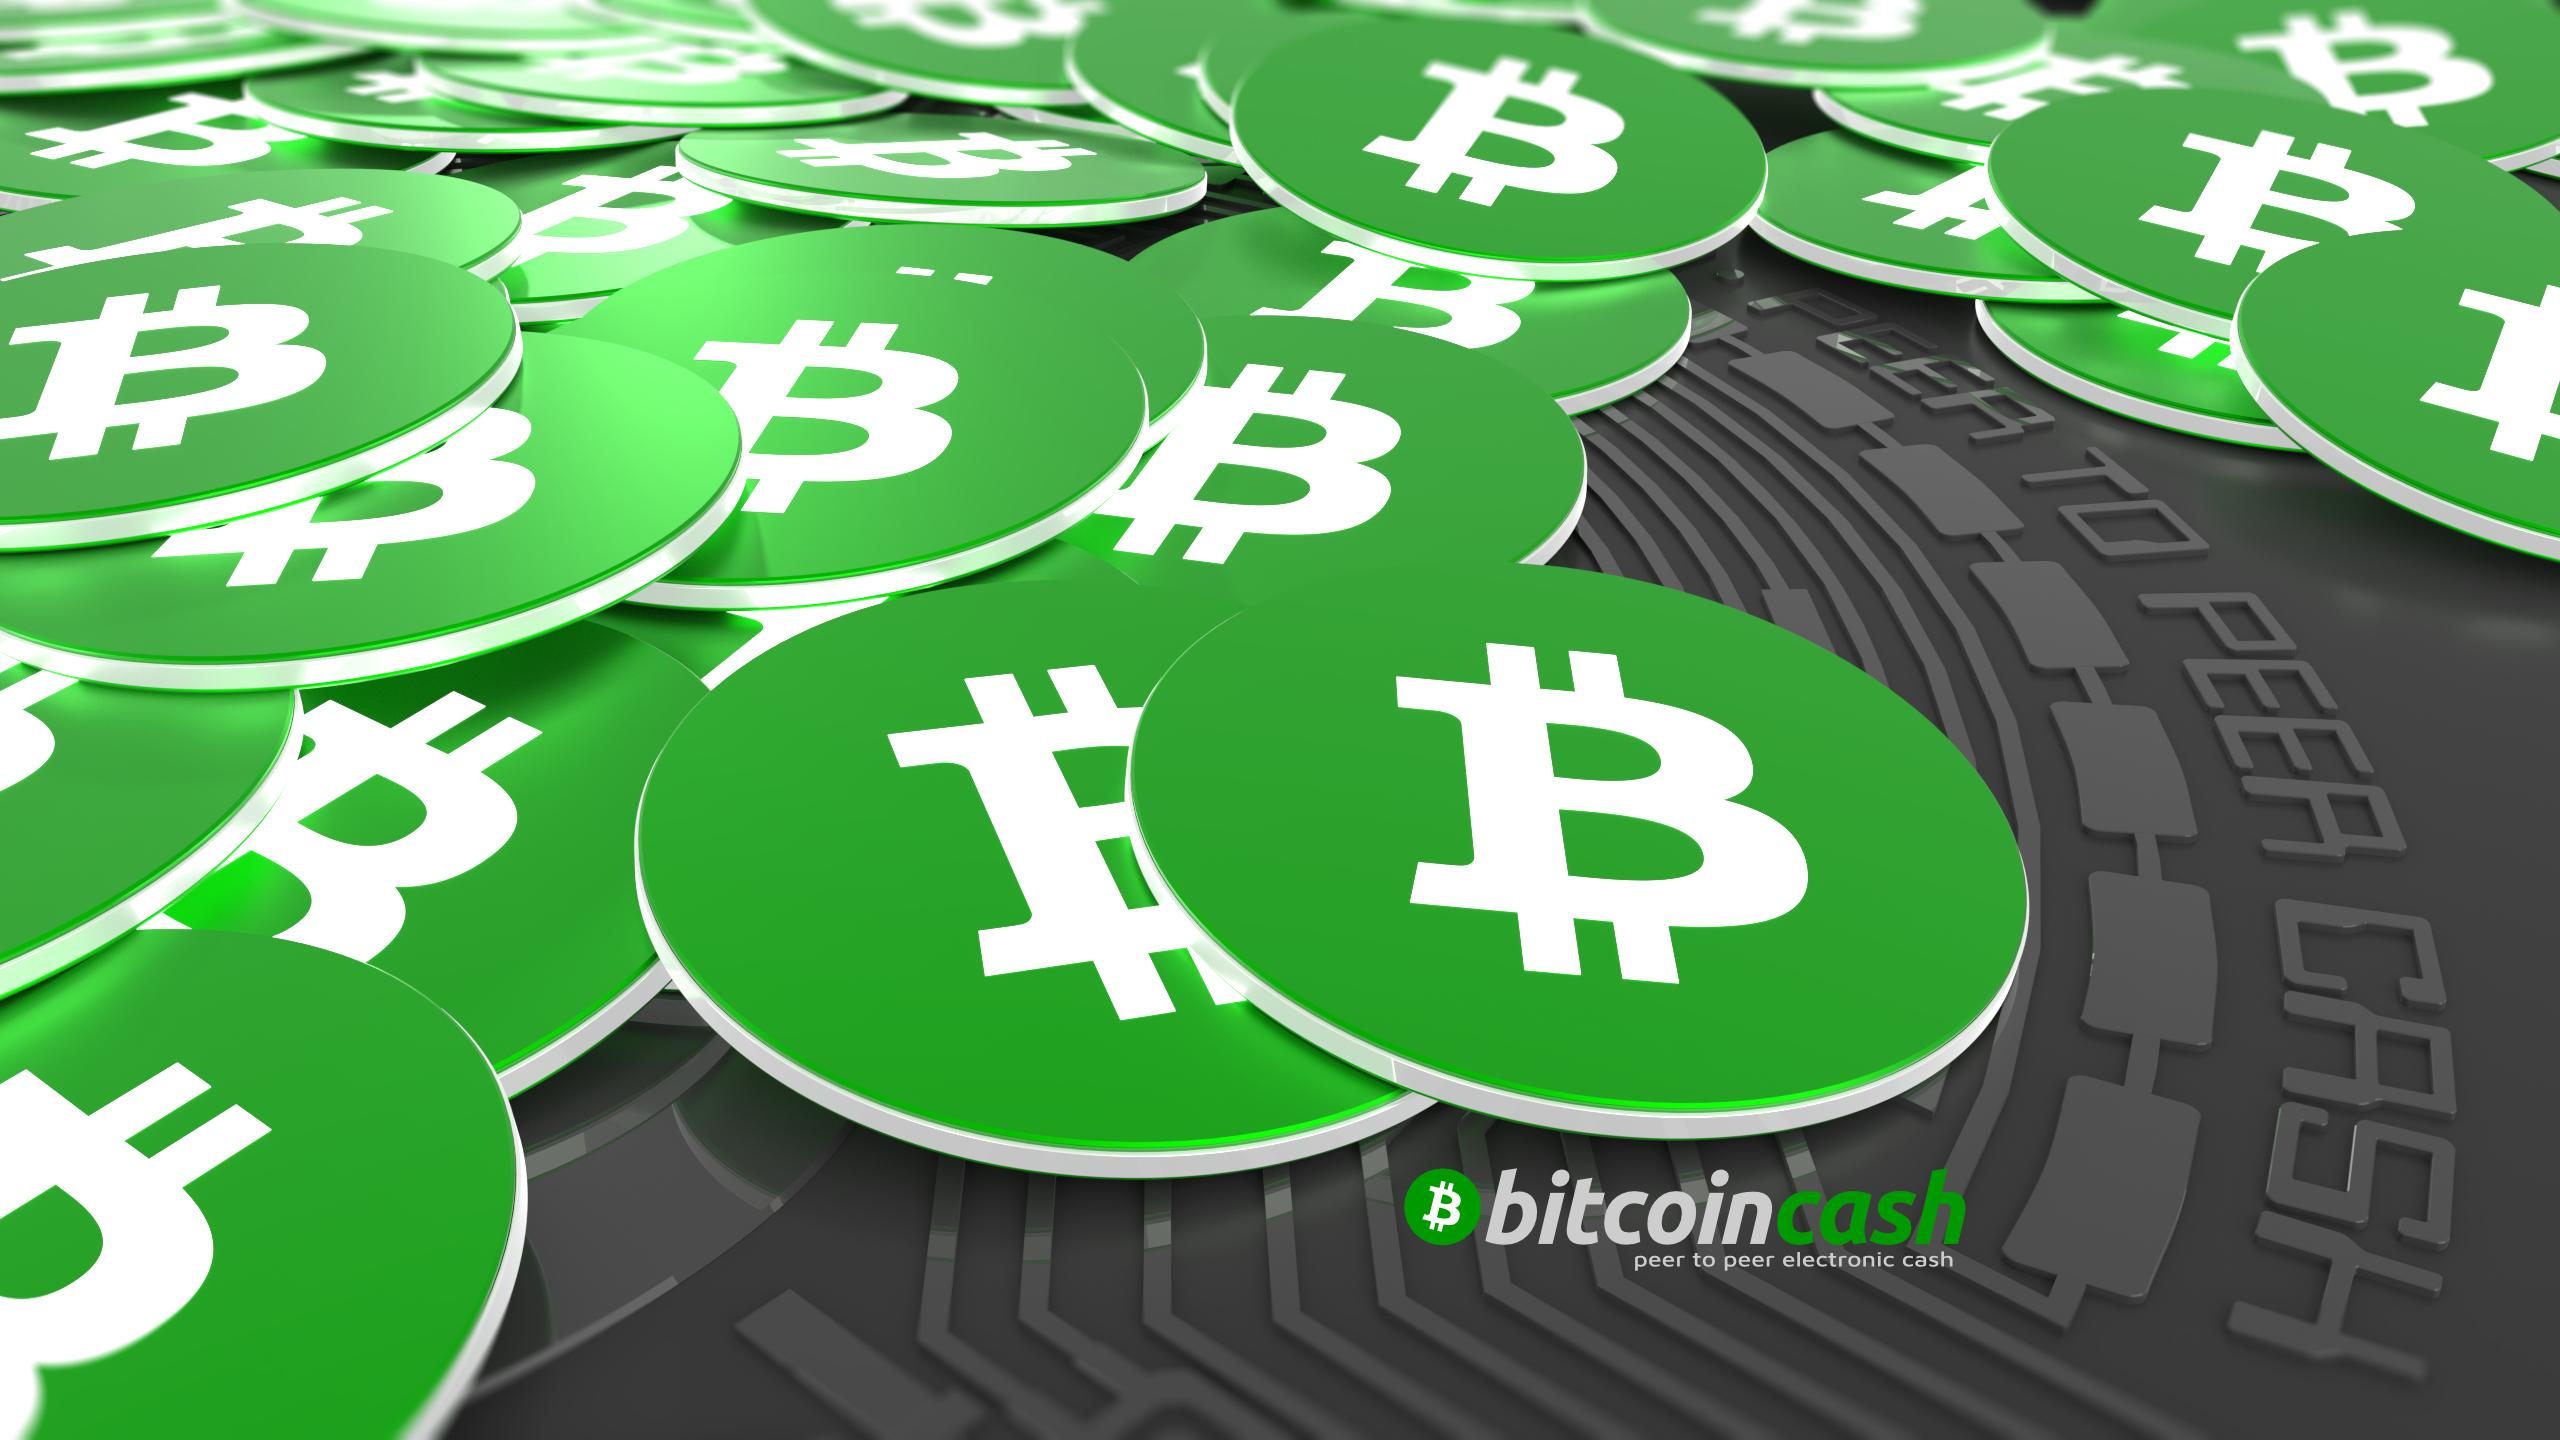 bitcoin-cash-price-rises